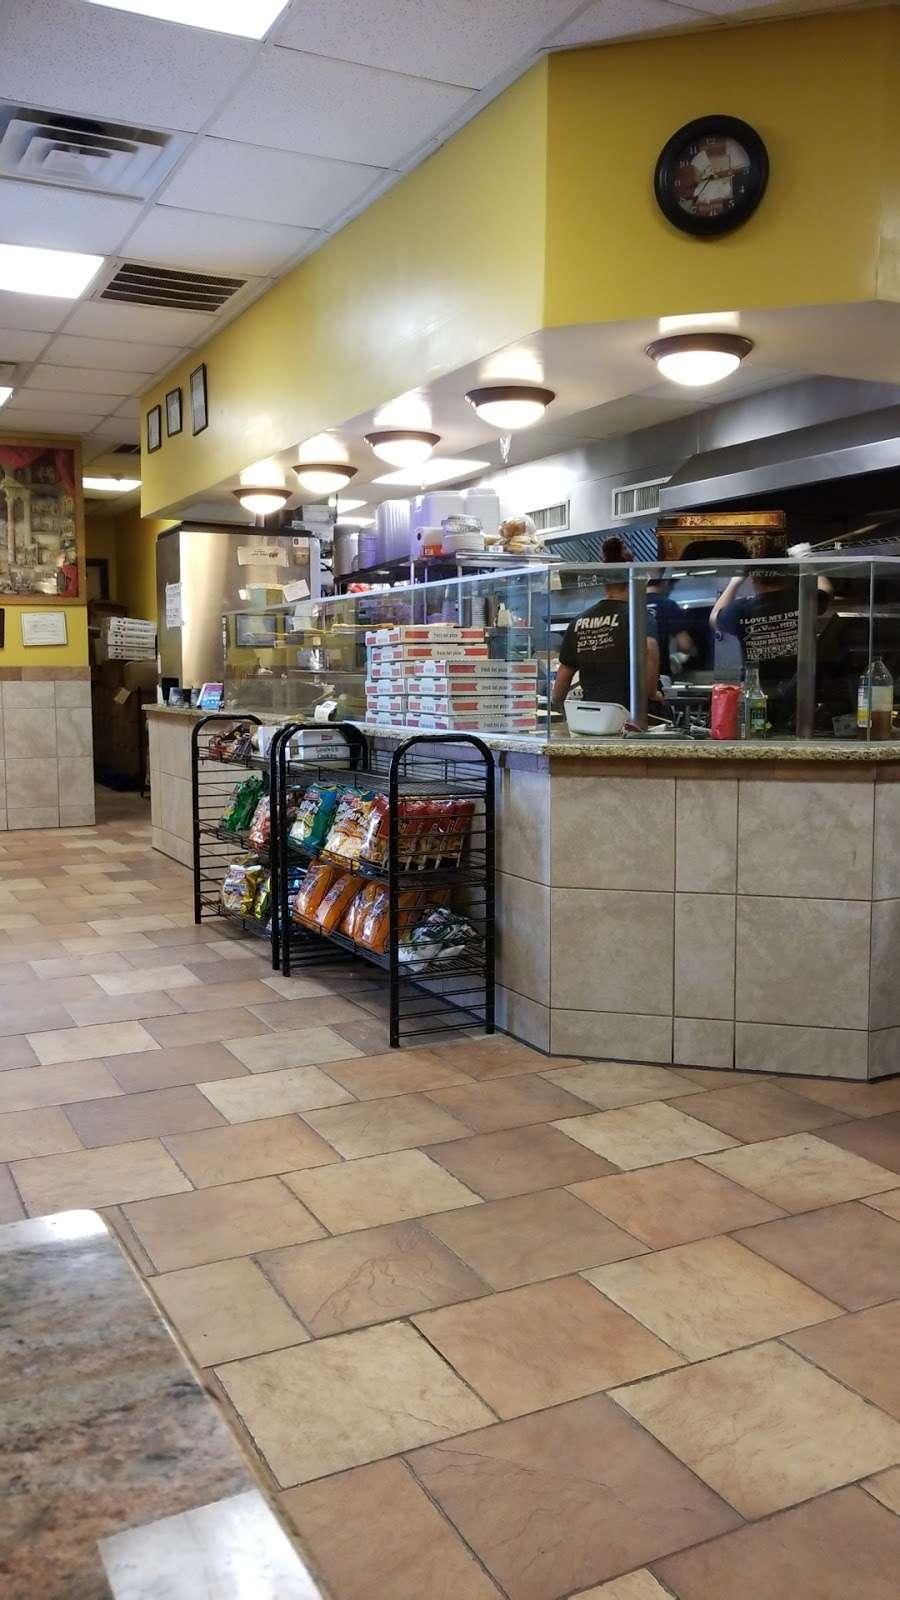 La Vera Pizza Meal Delivery 616 State Rd Croydon Pa